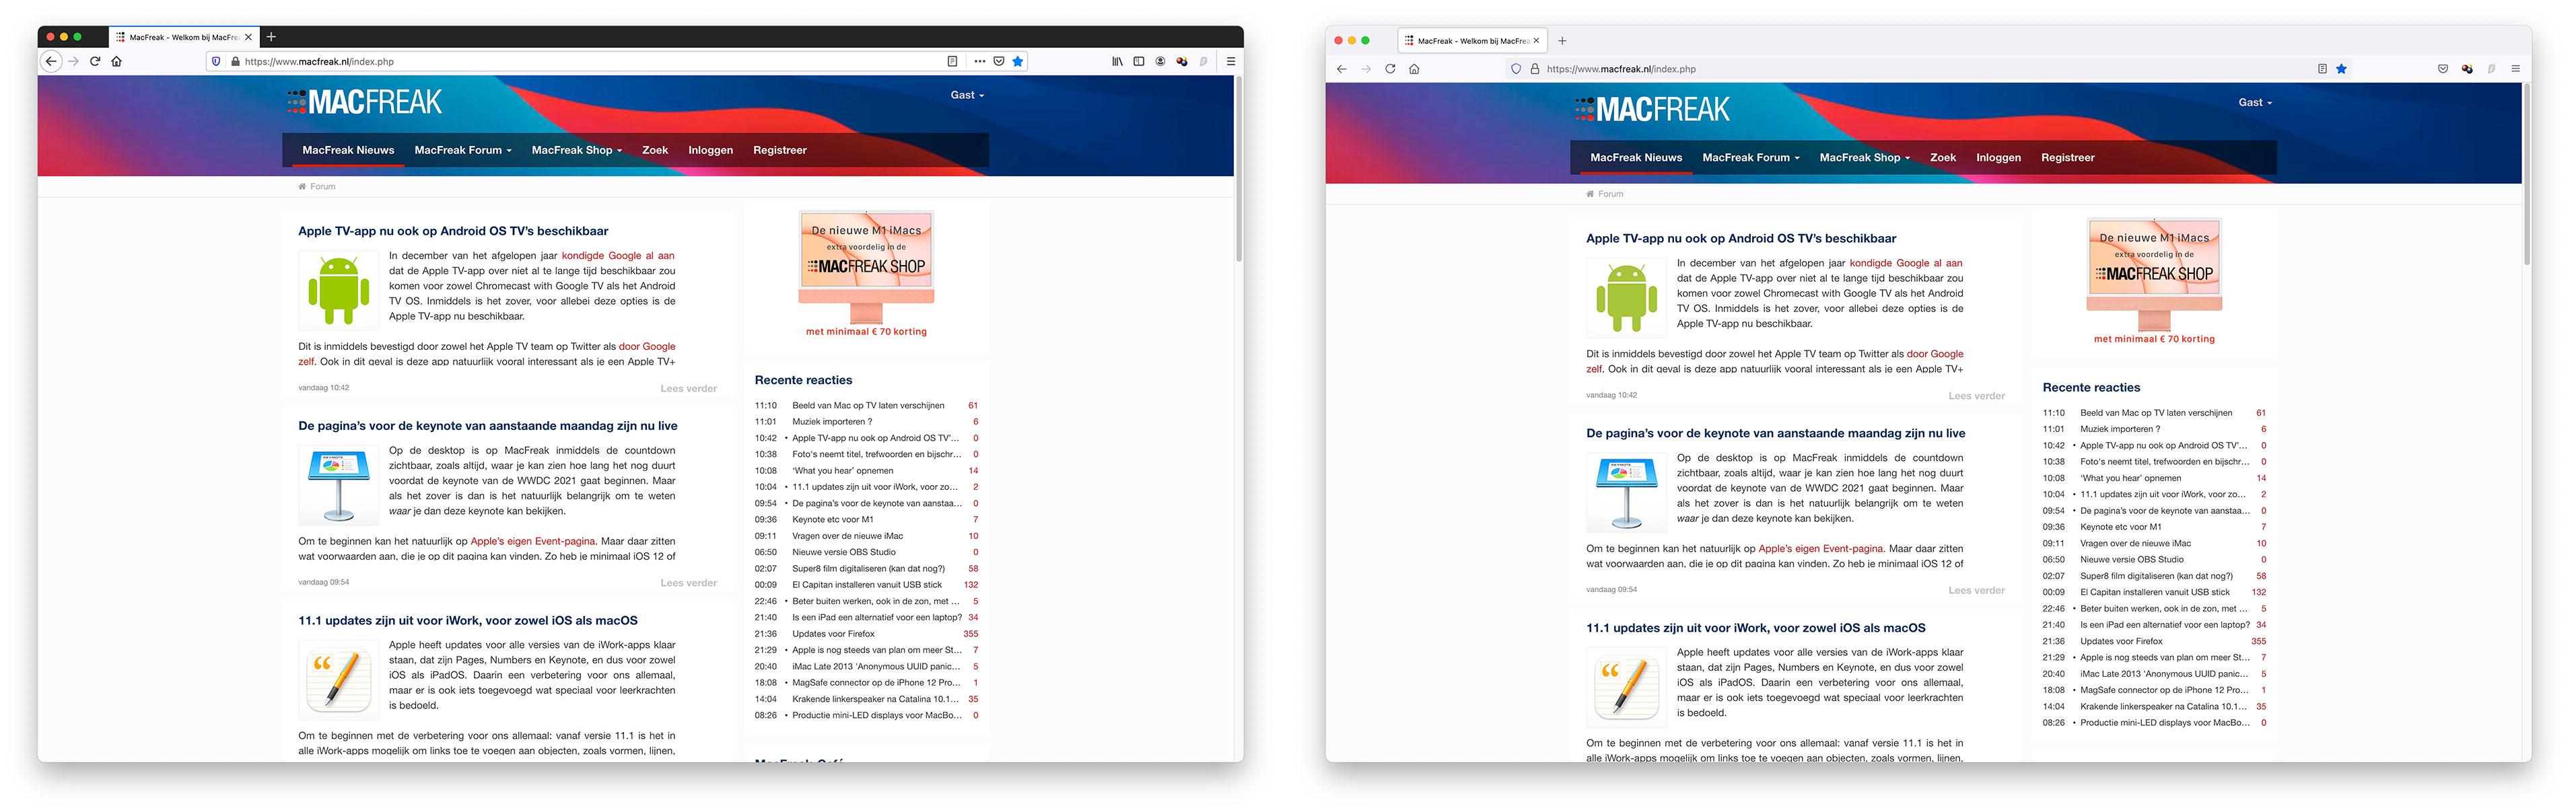 https://www.macfreak.nl/modules/news/images/zArt.Firefox89VergelijkOudereVersie.jpg